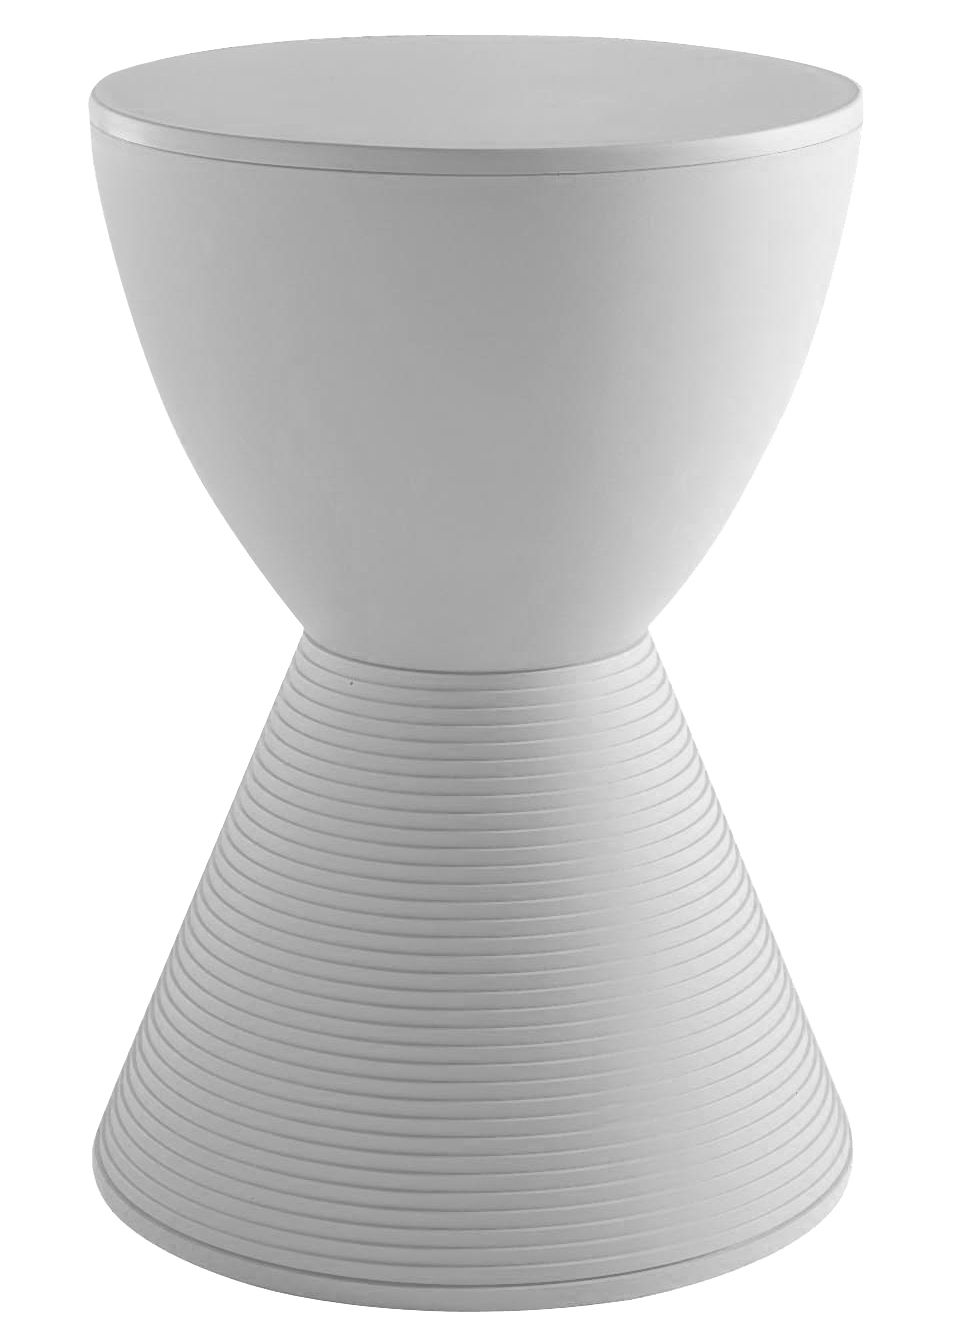 Arredamento - Sgabelli - Sgabello Prince AHA di Kartell - Bianco - Polipropilene